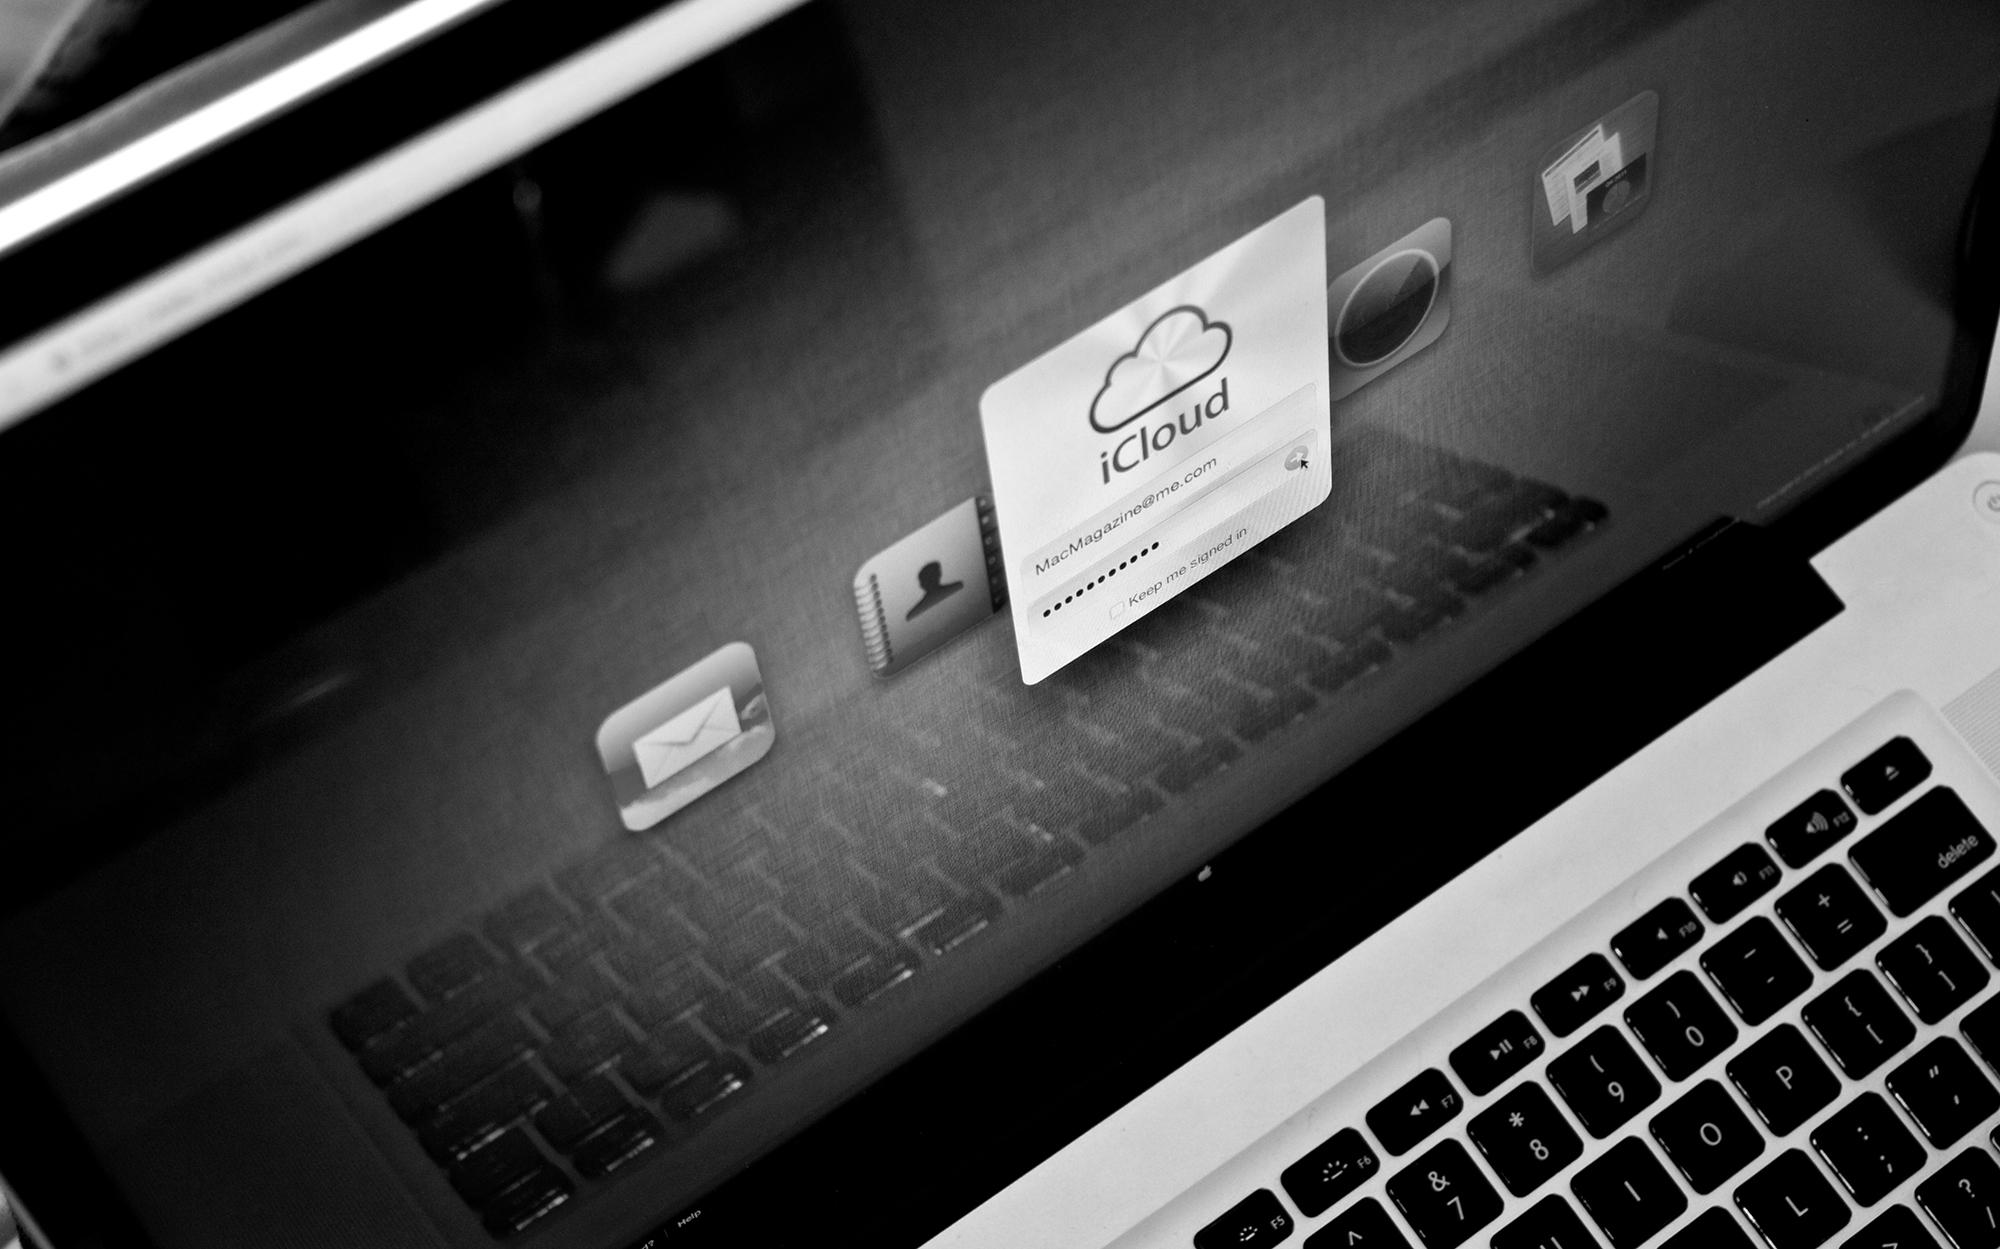 Tela de login do iCloud by MacMagazine - preto e branco